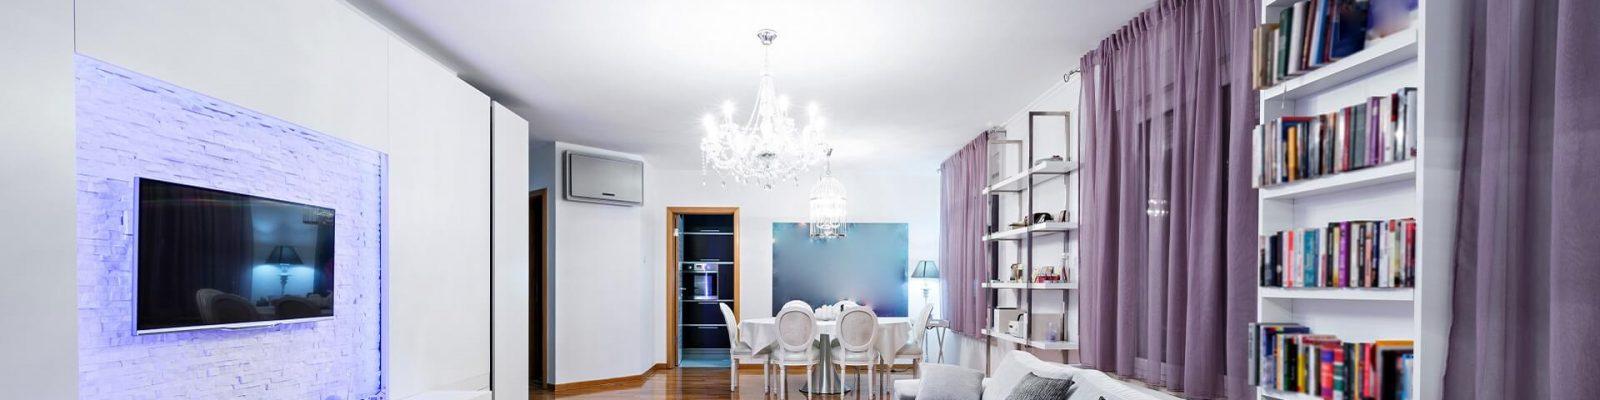 housezz-apartment